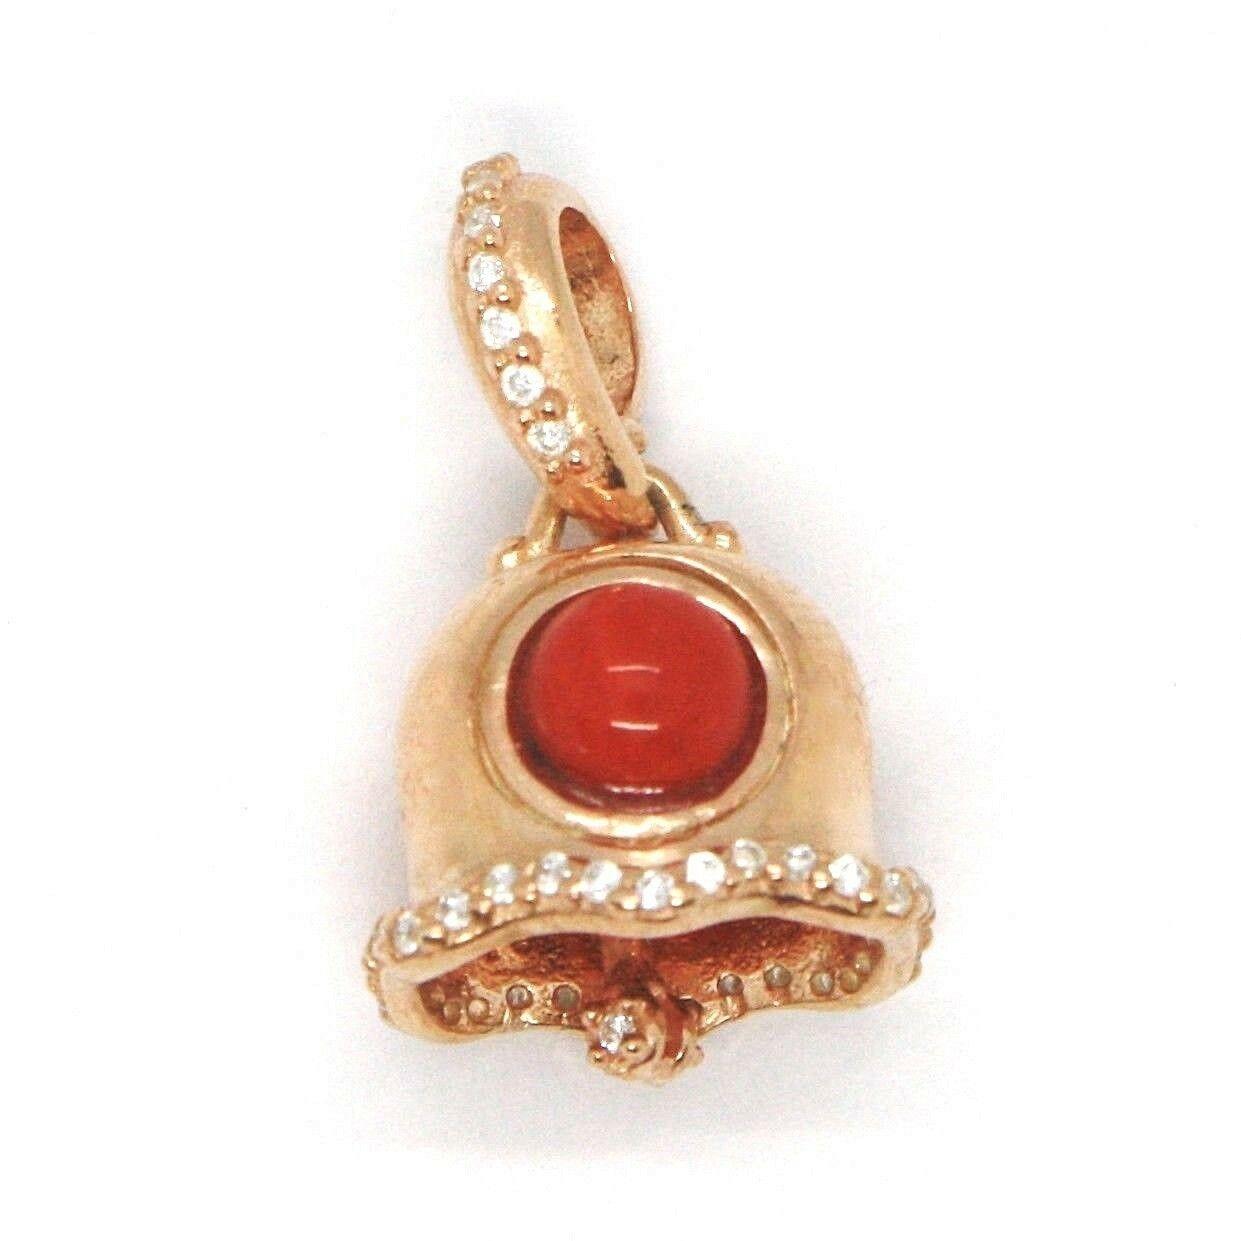 Silber Anhänger 925, Glocke, Glocke mit Zirkonia, Koralle, Anhänger image 3